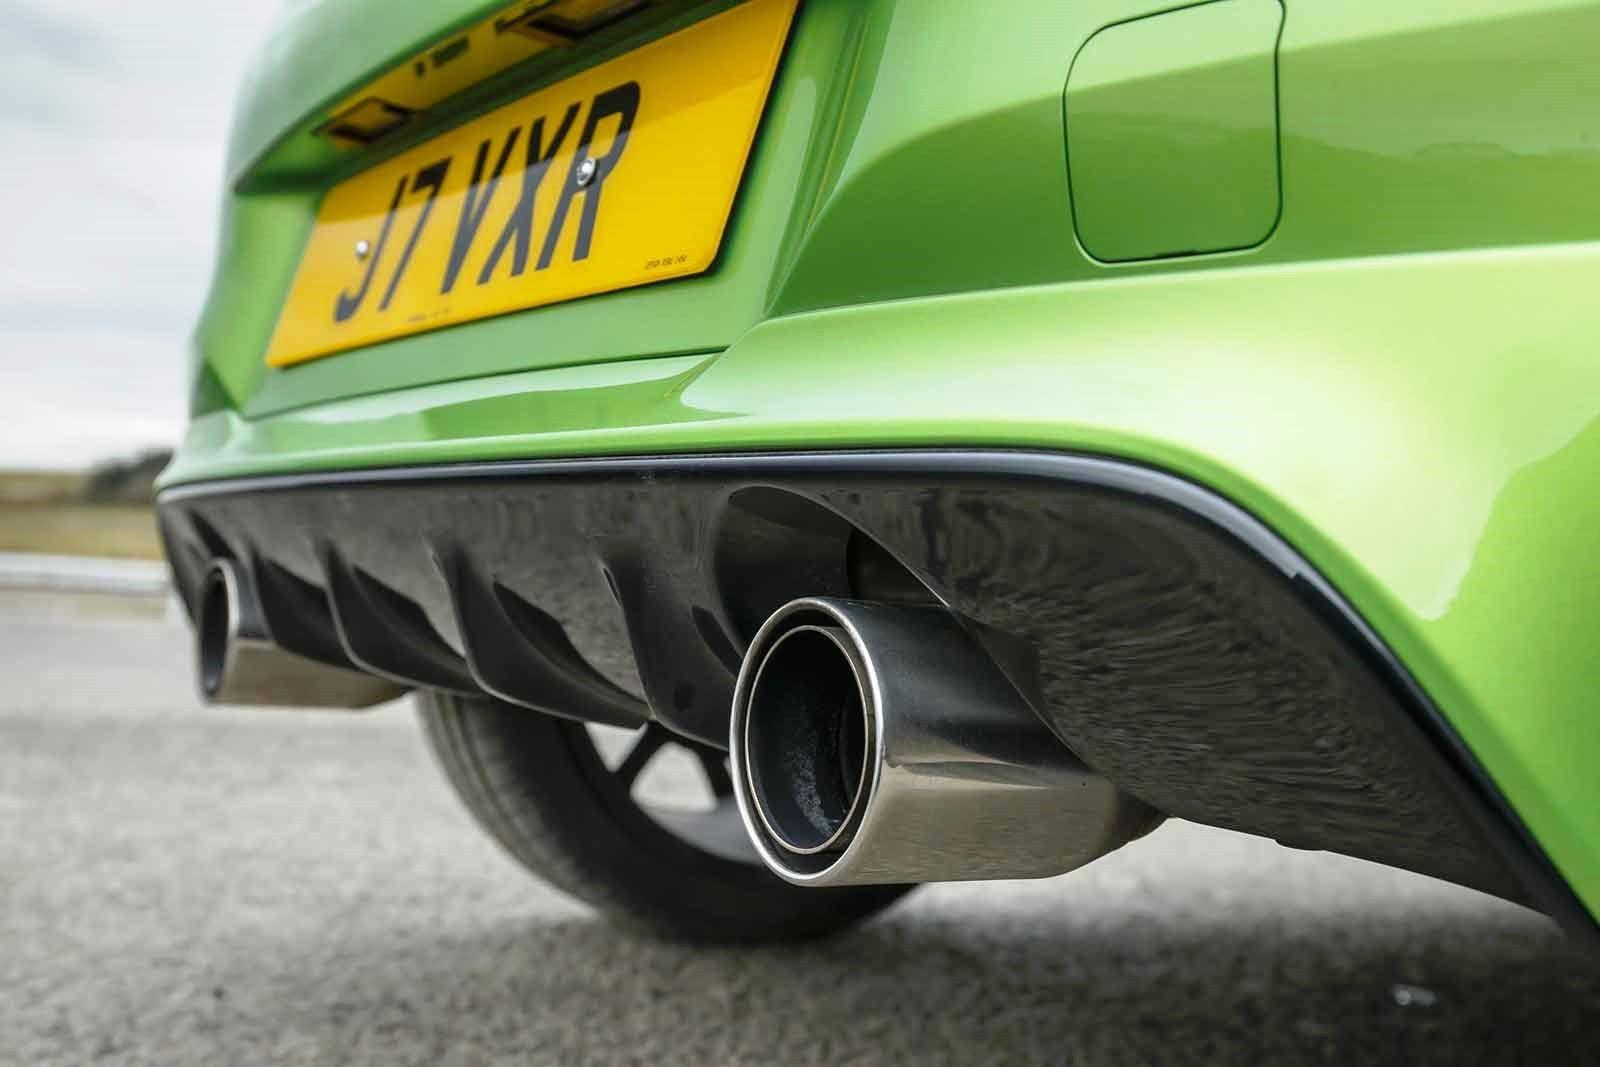 Vauxhall Corsa VXR Exhaust